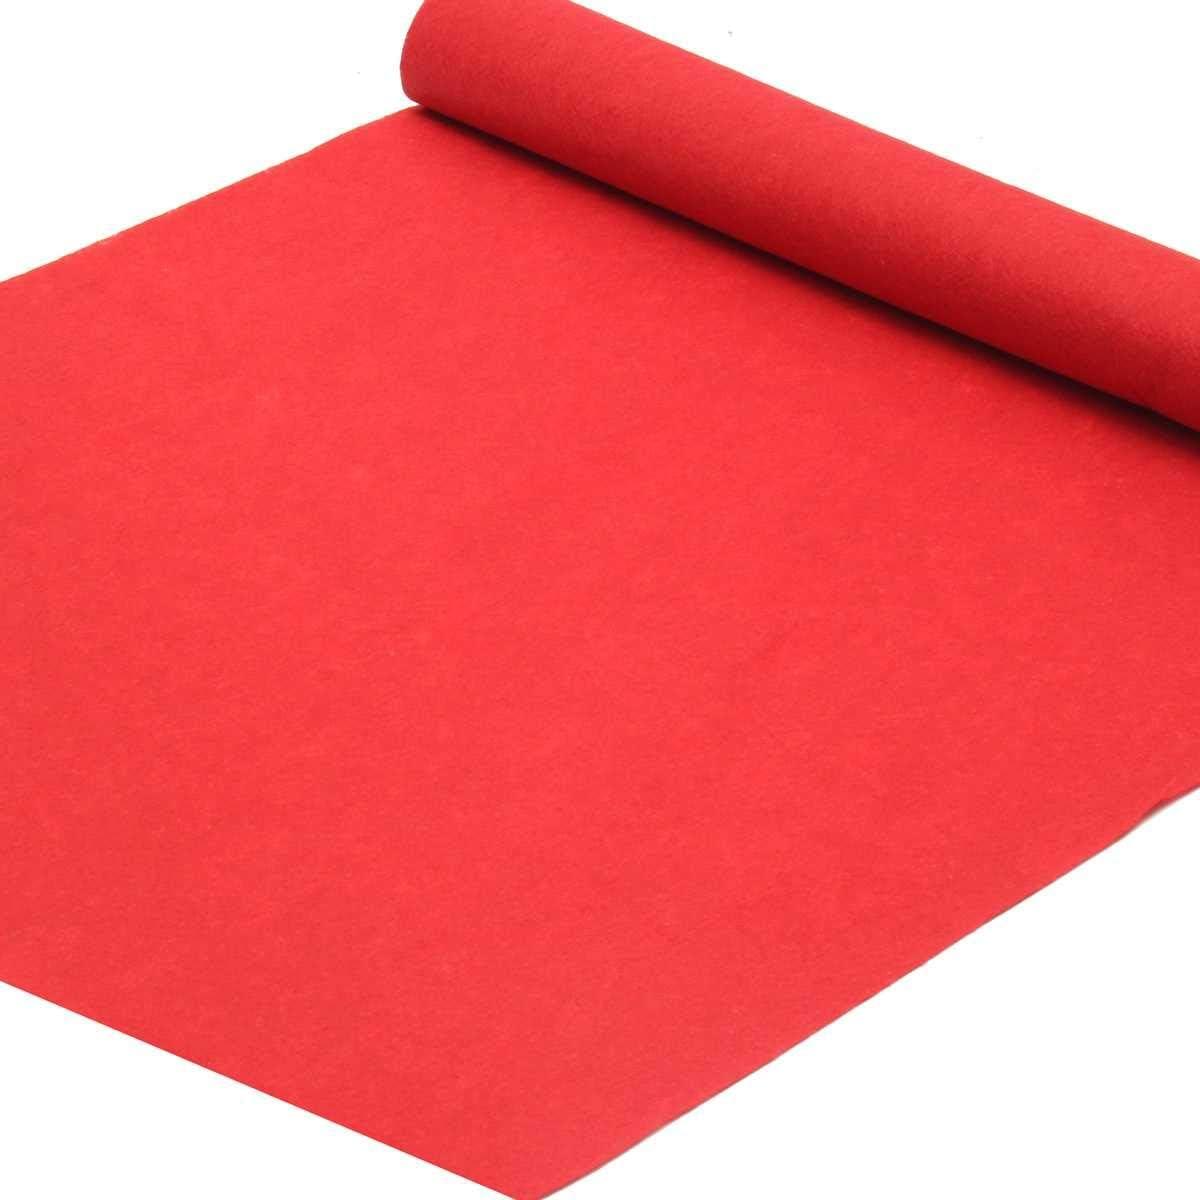 BINGHC Carpet 6 9 13 15m Mats for Aisle Max 90% OFF Outdoor Red Regular discount Wedd